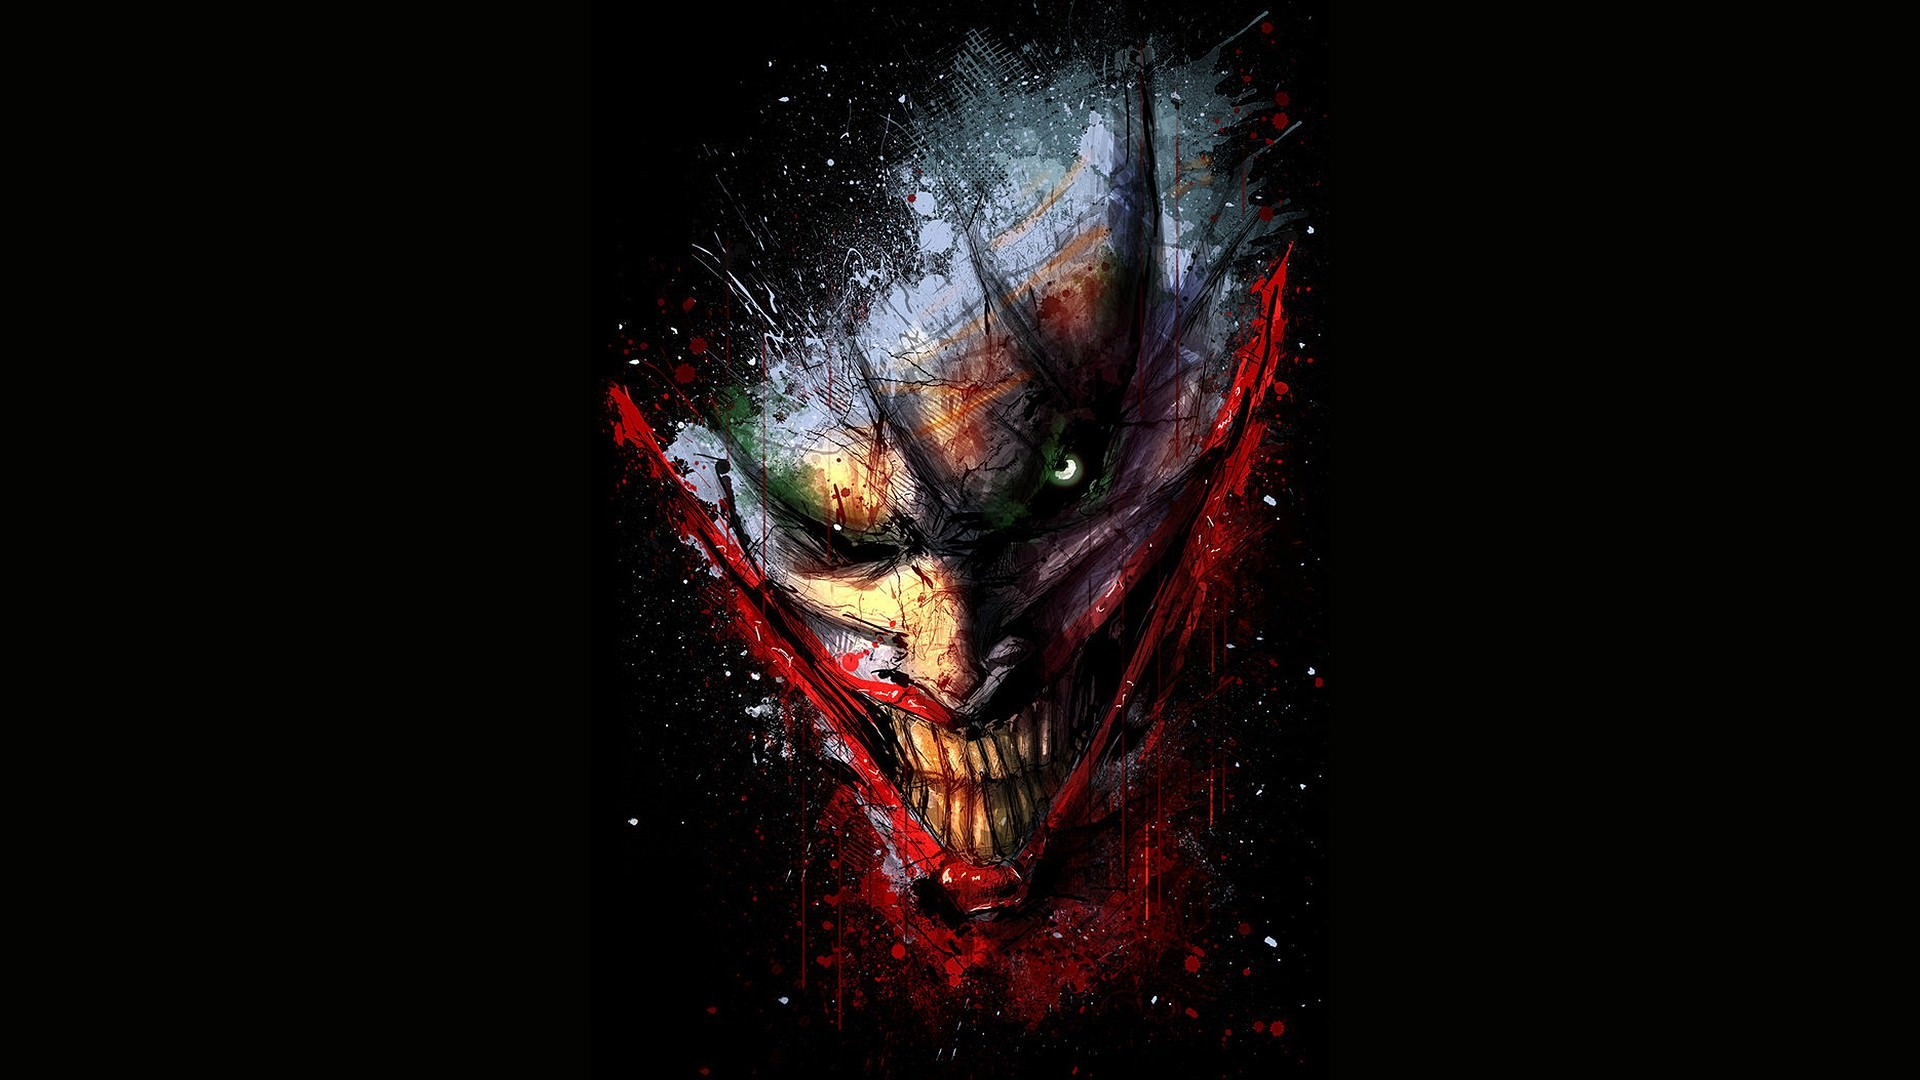 Batman DC Comics The Joker Wallpaper – DigitalArt.io